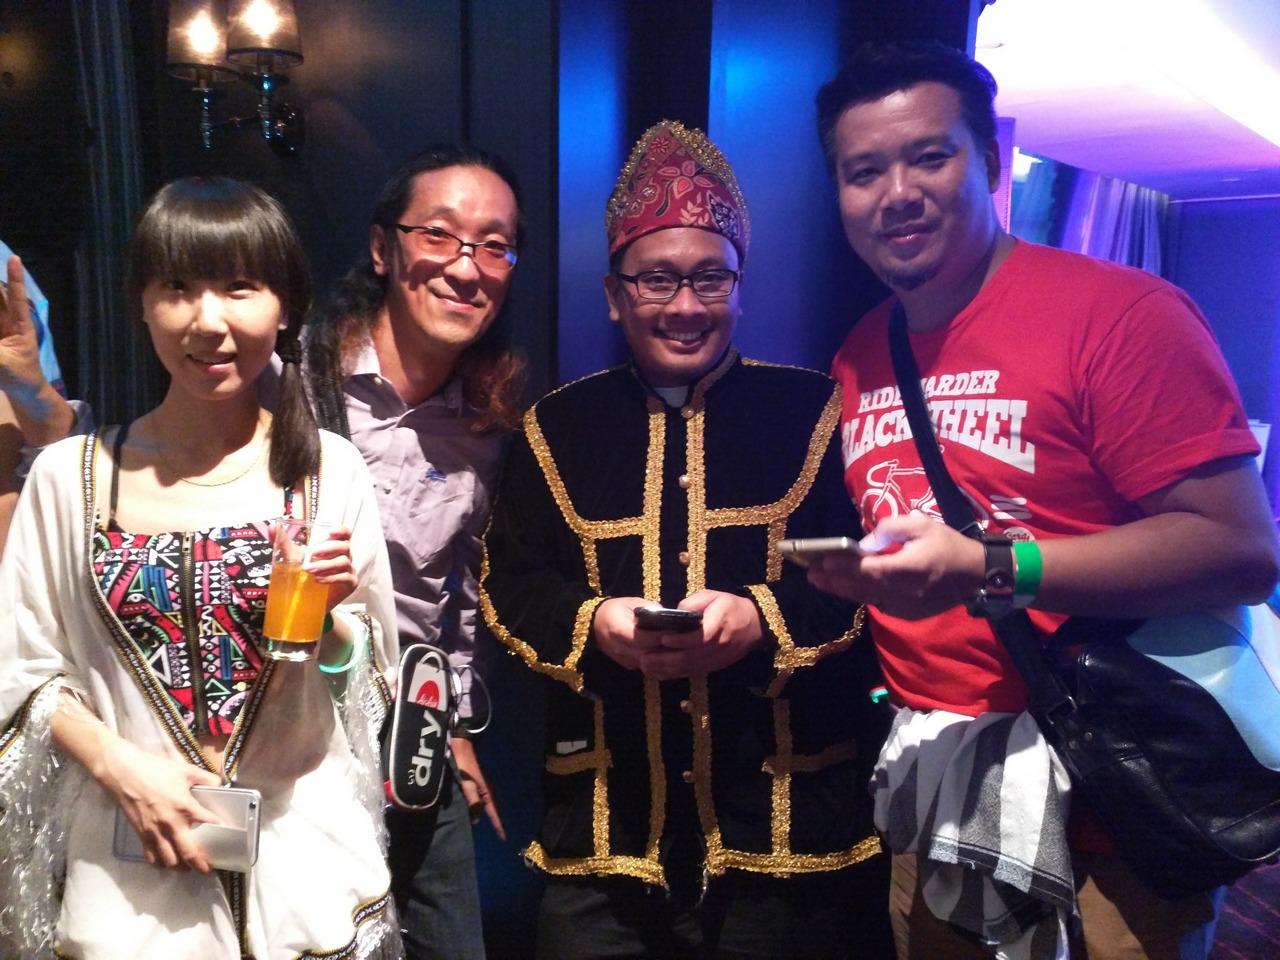 Air Asiaのブロガーイベントにバンコクまで行ってきたよ!